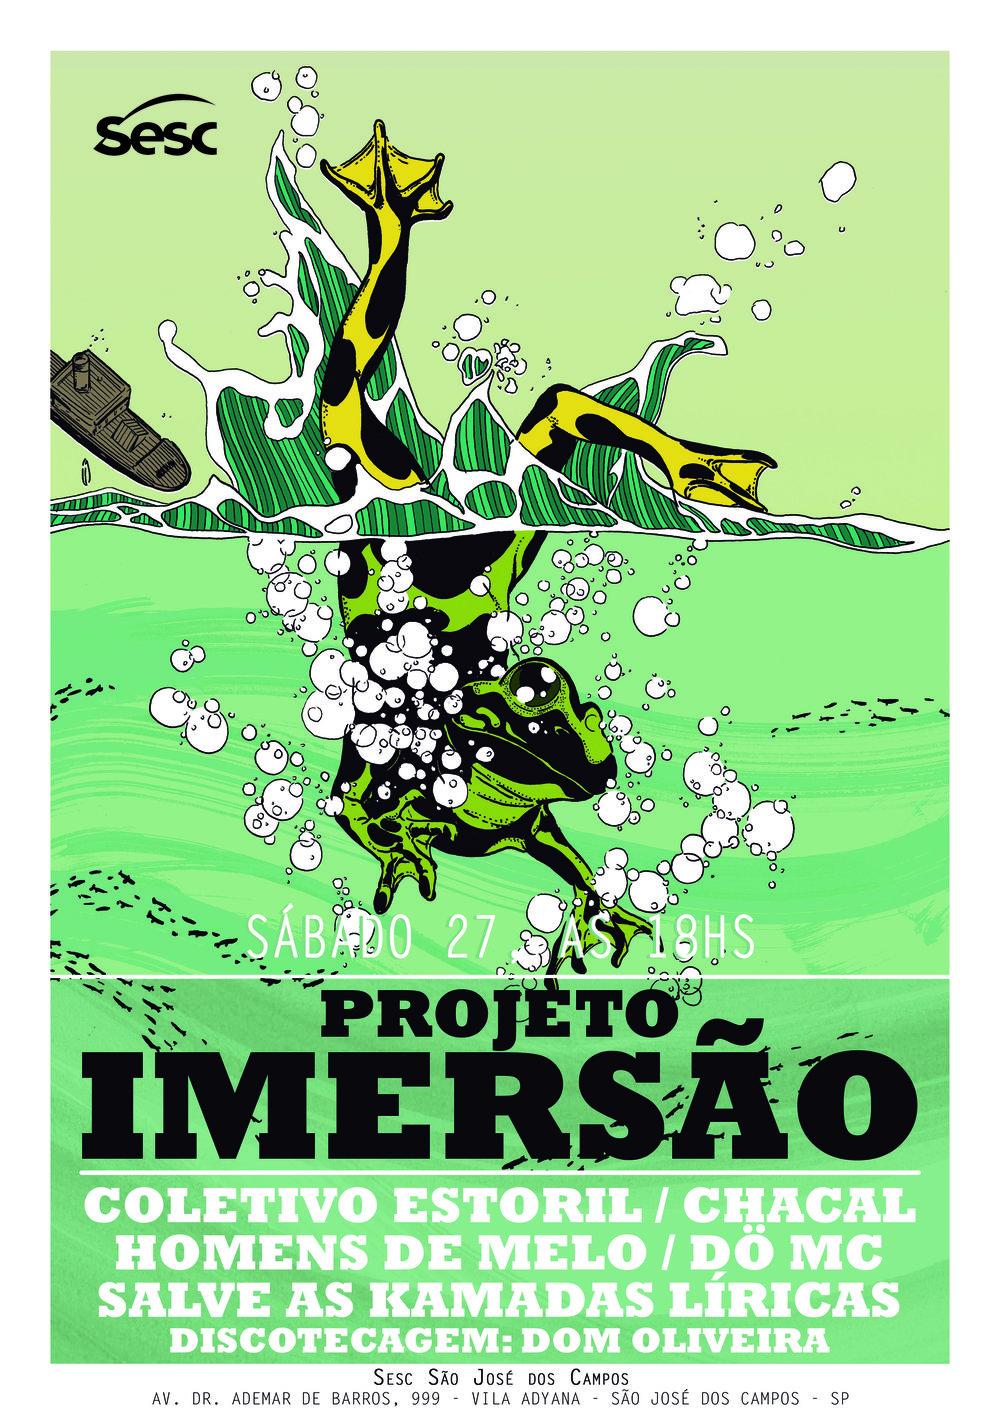 PROJETO_IMERSAO_09-12.jpg